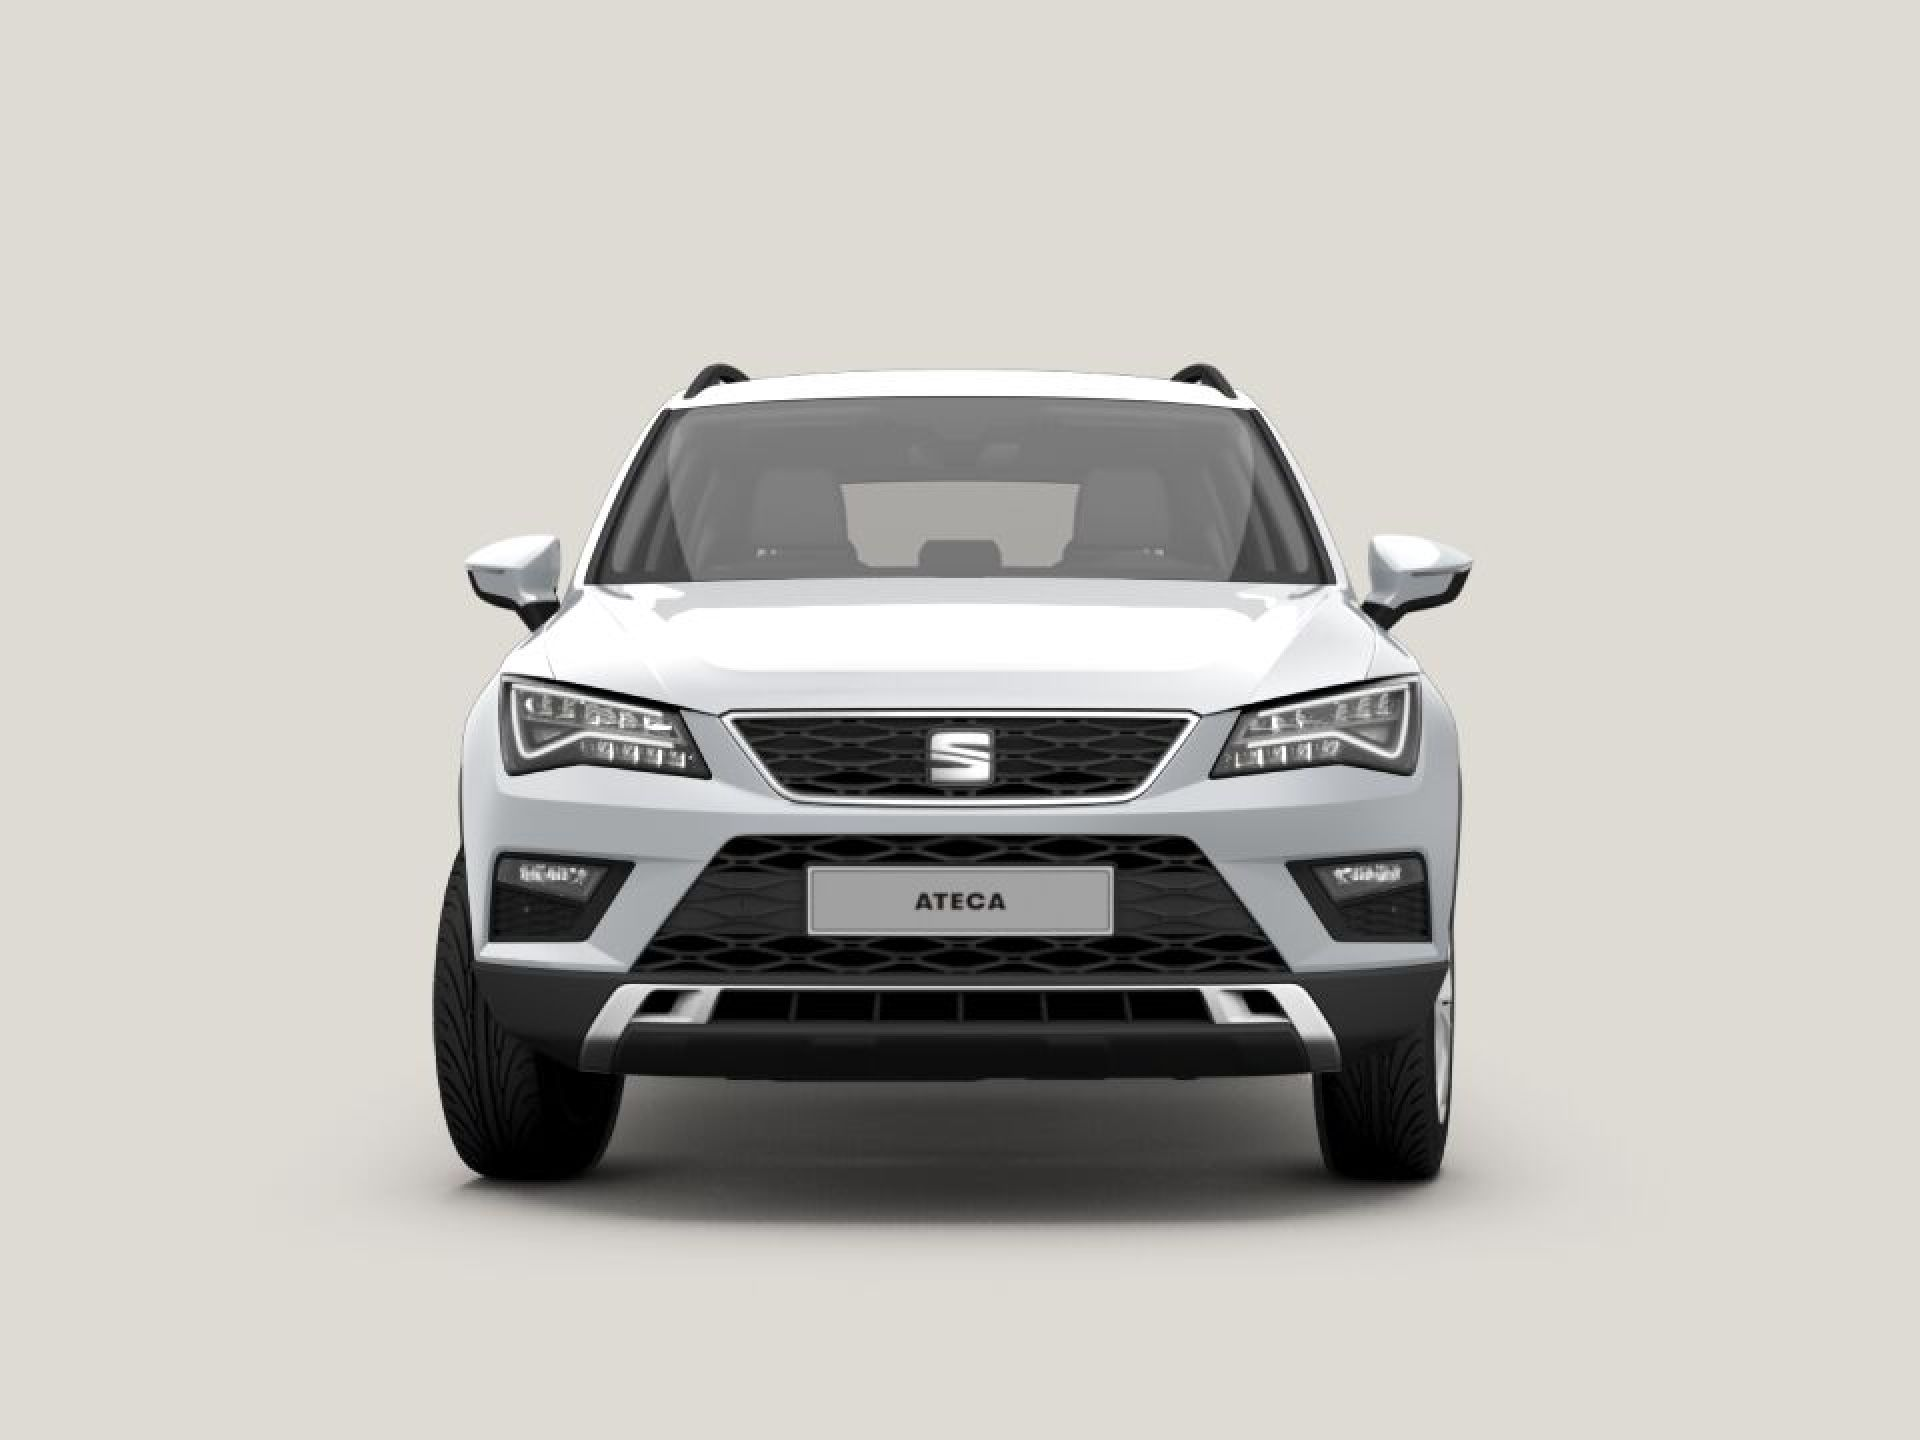 SEAT Ateca 1.6 TDI 85kW St&Sp Style Edit. Nav Eco nuevo Madrid